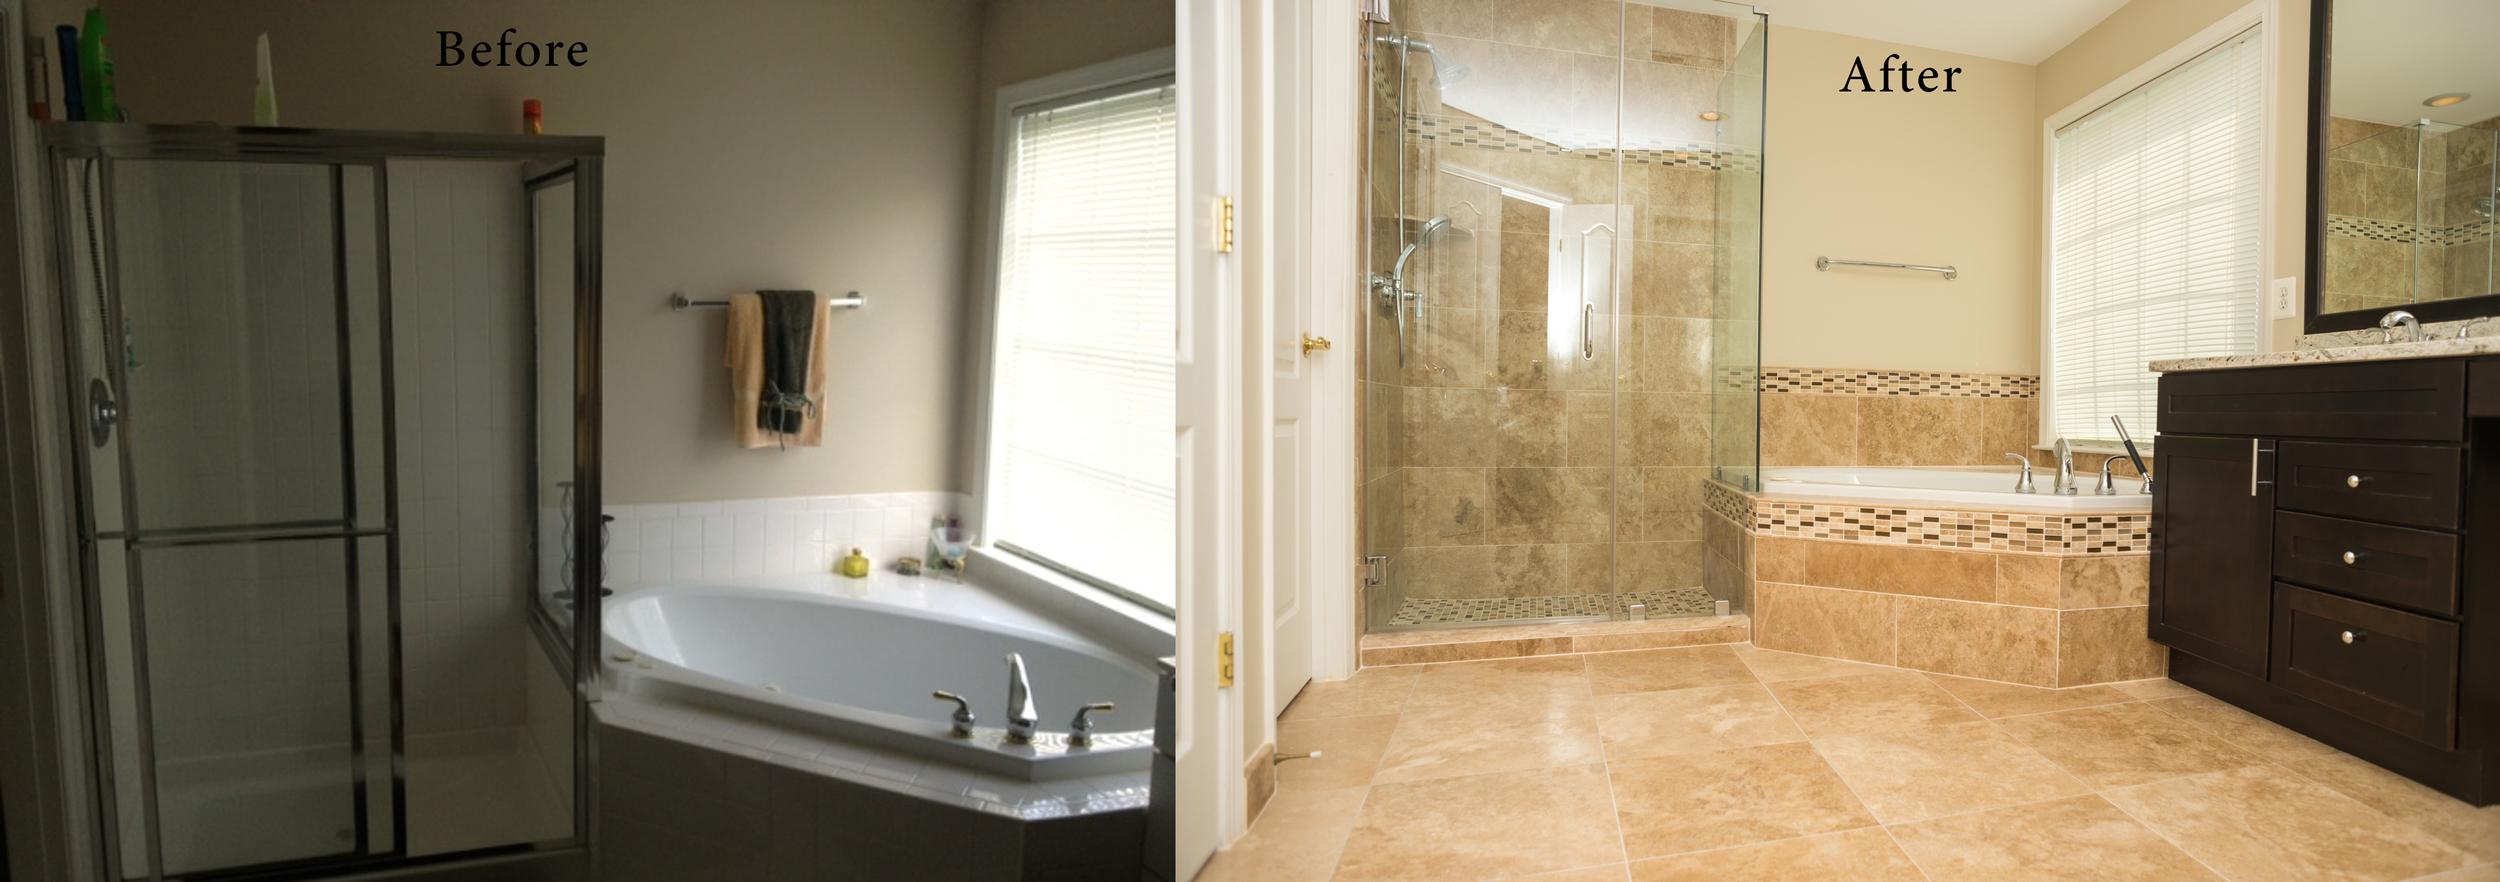 Bathroom remodeling Columbia, MD